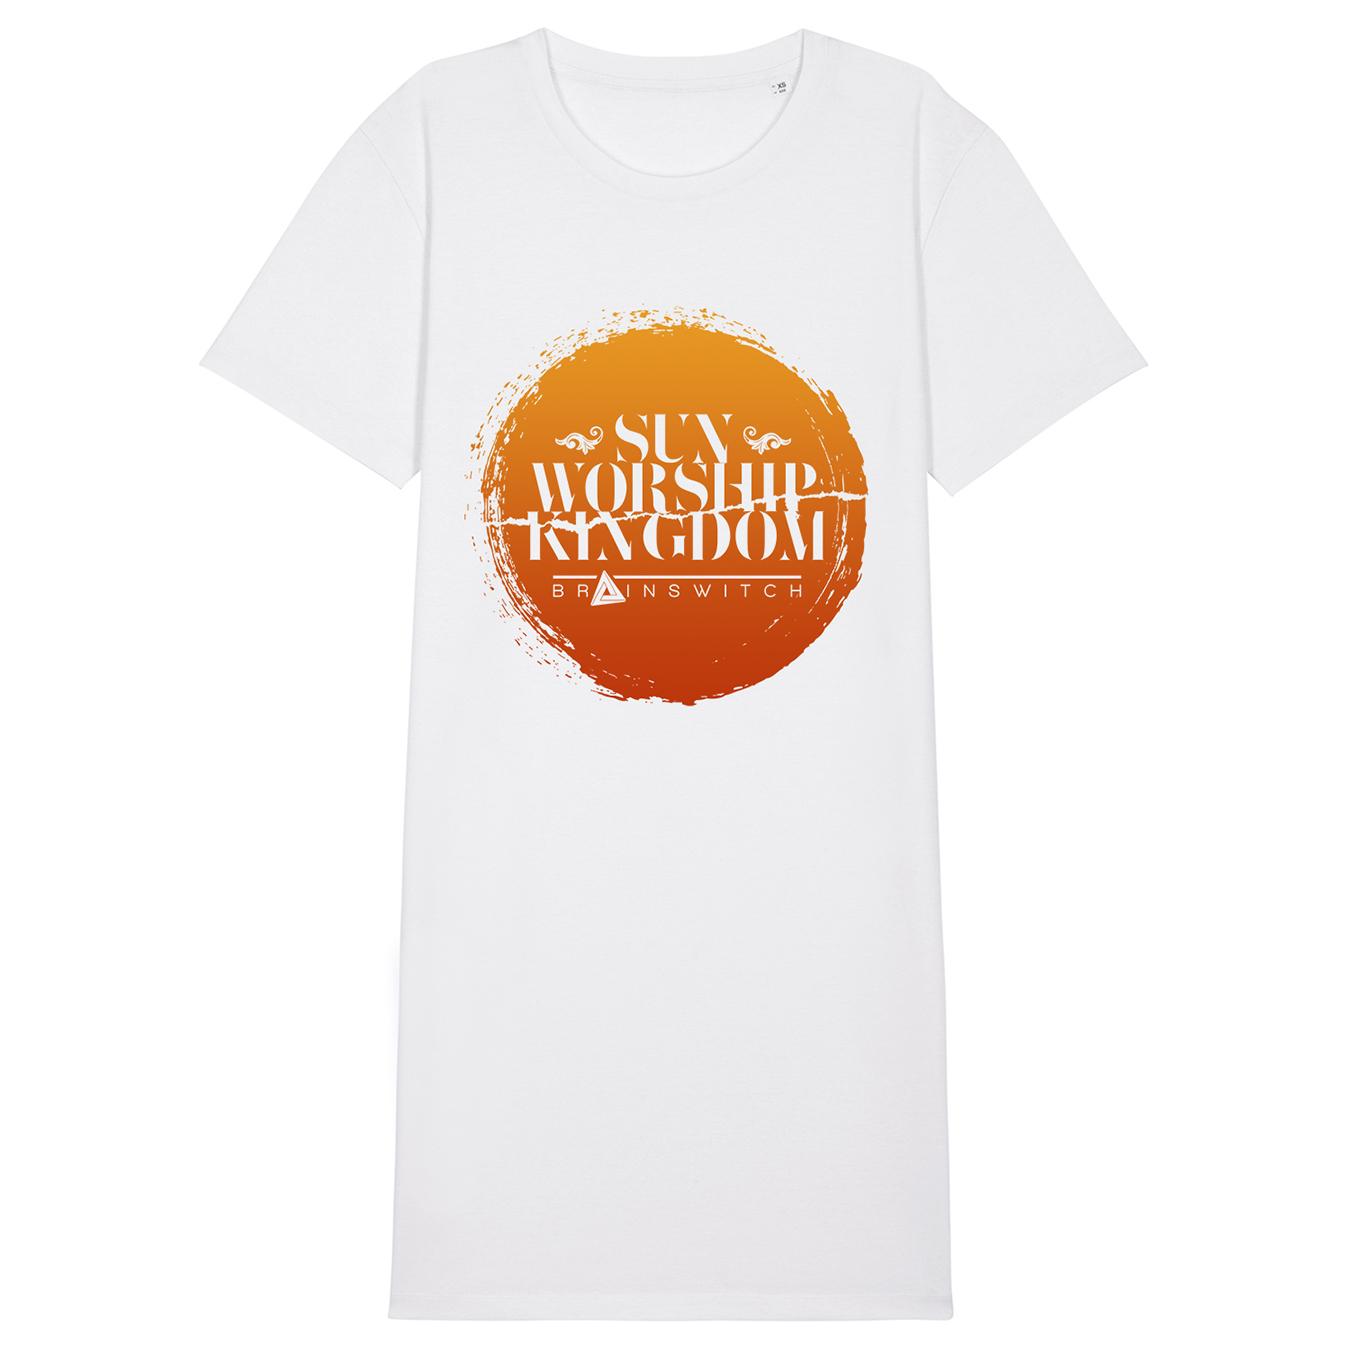 BRAINSWITCH - Sun Worship Kingdom - T-Shirt Dress